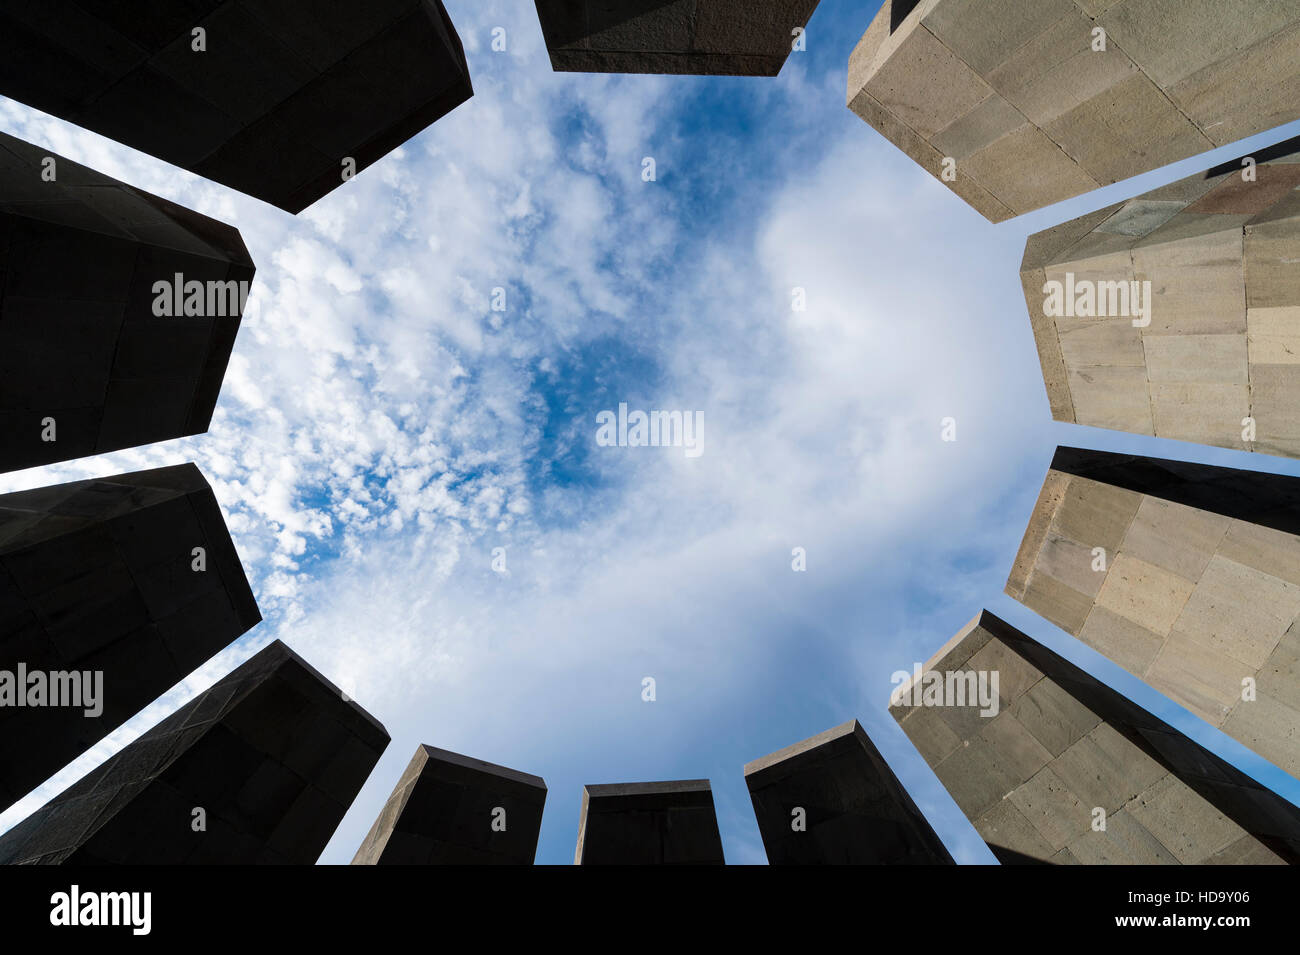 Armenian genocide memorial Tsitsernakaberd, Yerevan, Armenia, Caucasus, Middle East, Asia - Stock Image